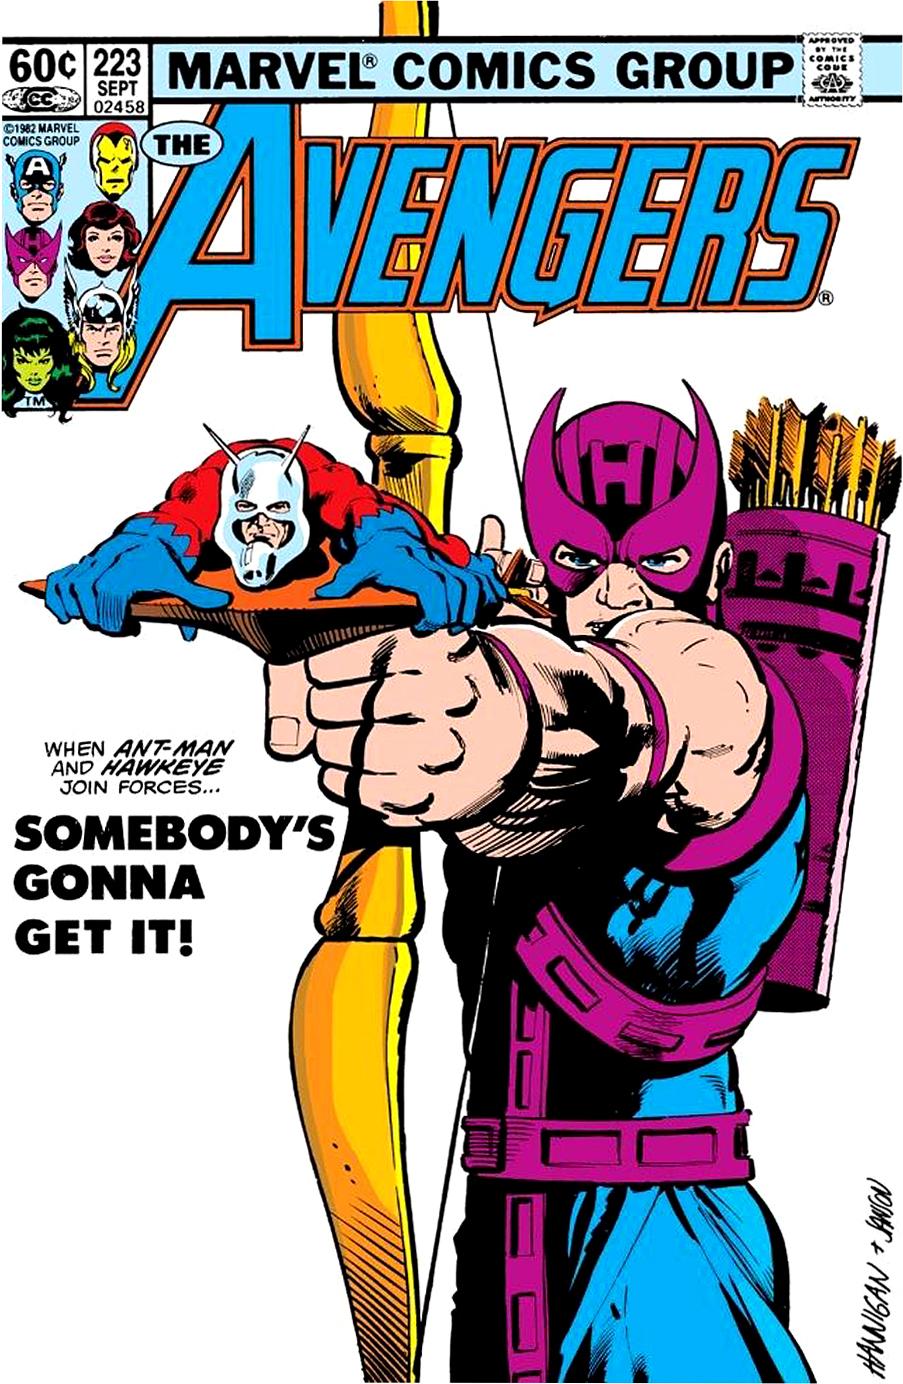 http://vignette1.wikia.nocookie.net/marveldatabase/images/f/f5/Avengers_Vol_1_223.jpg/revision/latest?cb=20161125032038